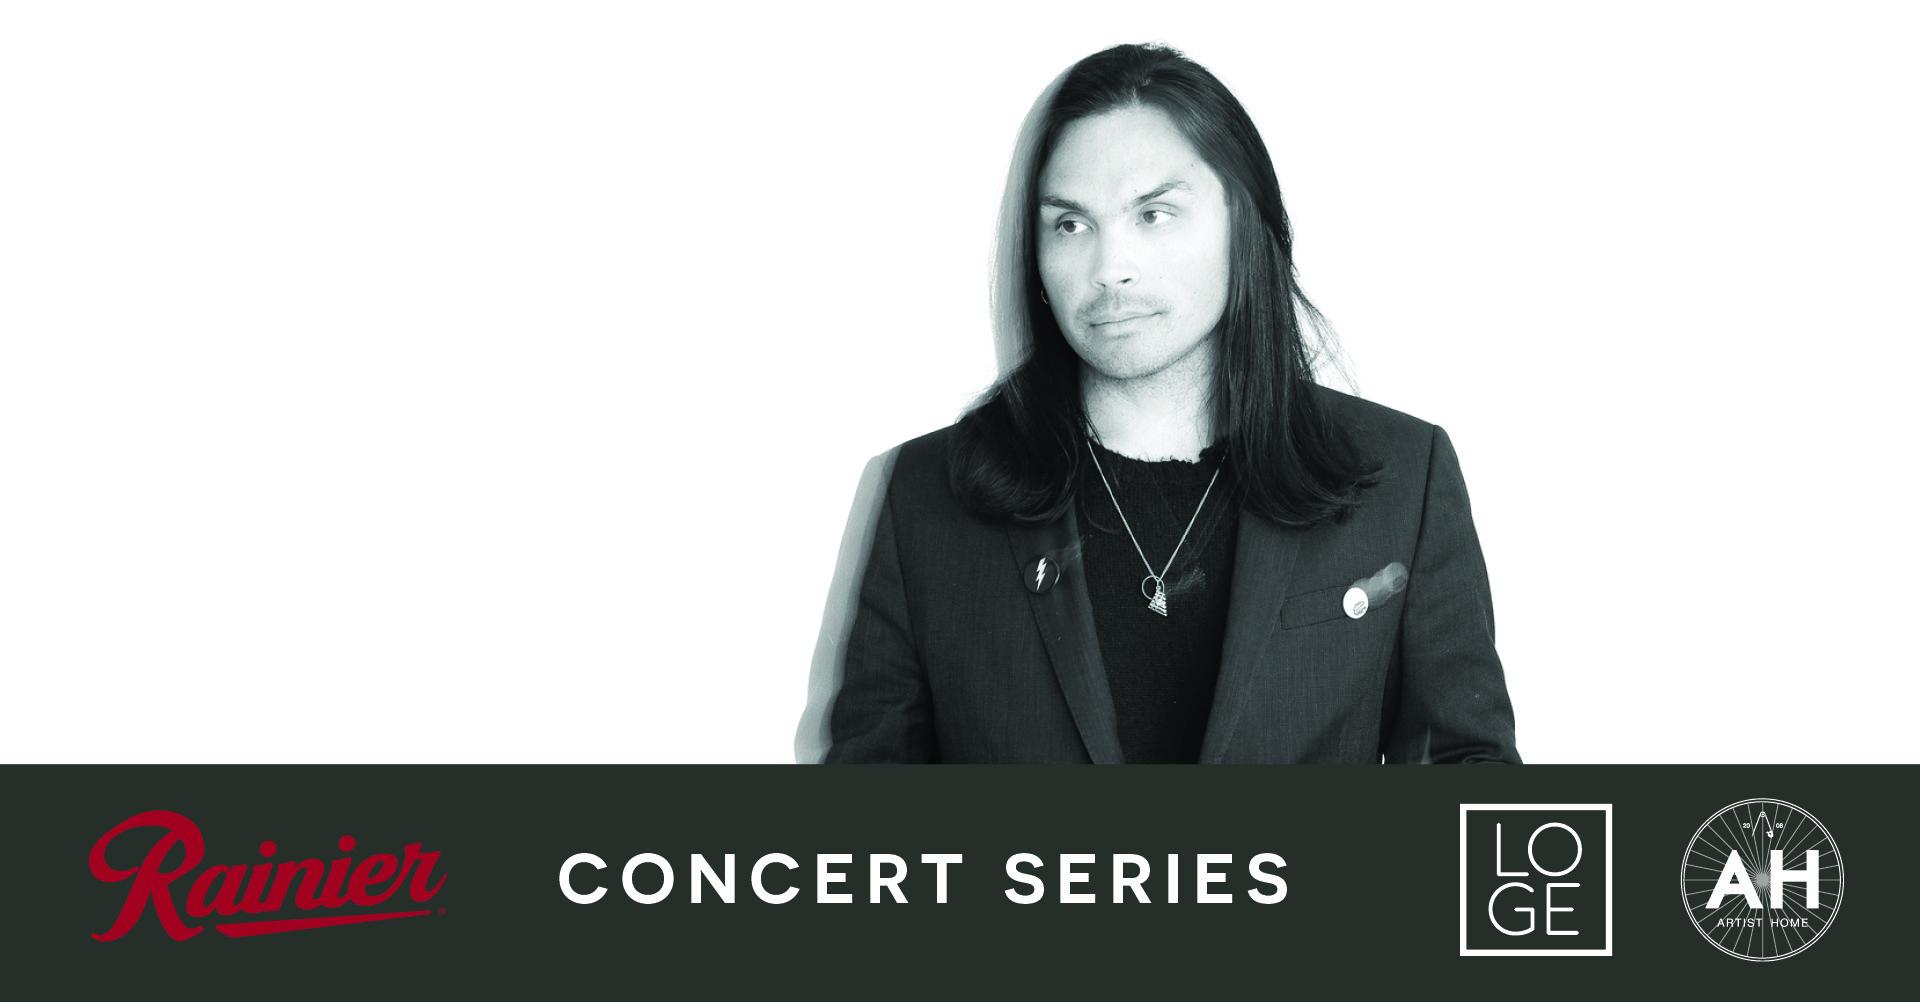 EC_Concert_Arthur James.jpg